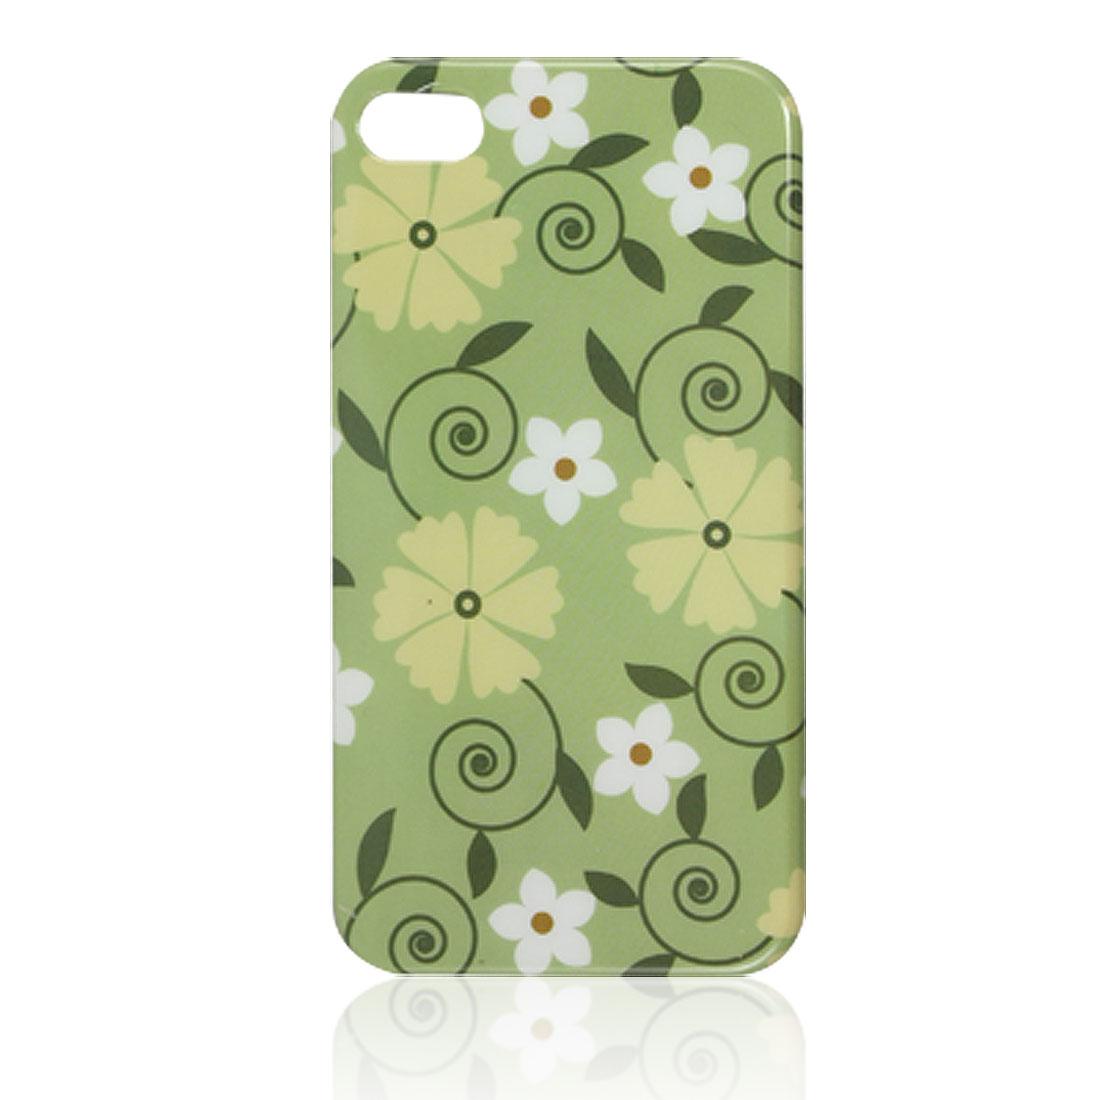 IMD Flower Leaf Detail Green Plastic Back Shell Case for iPhone 4 4G 4S